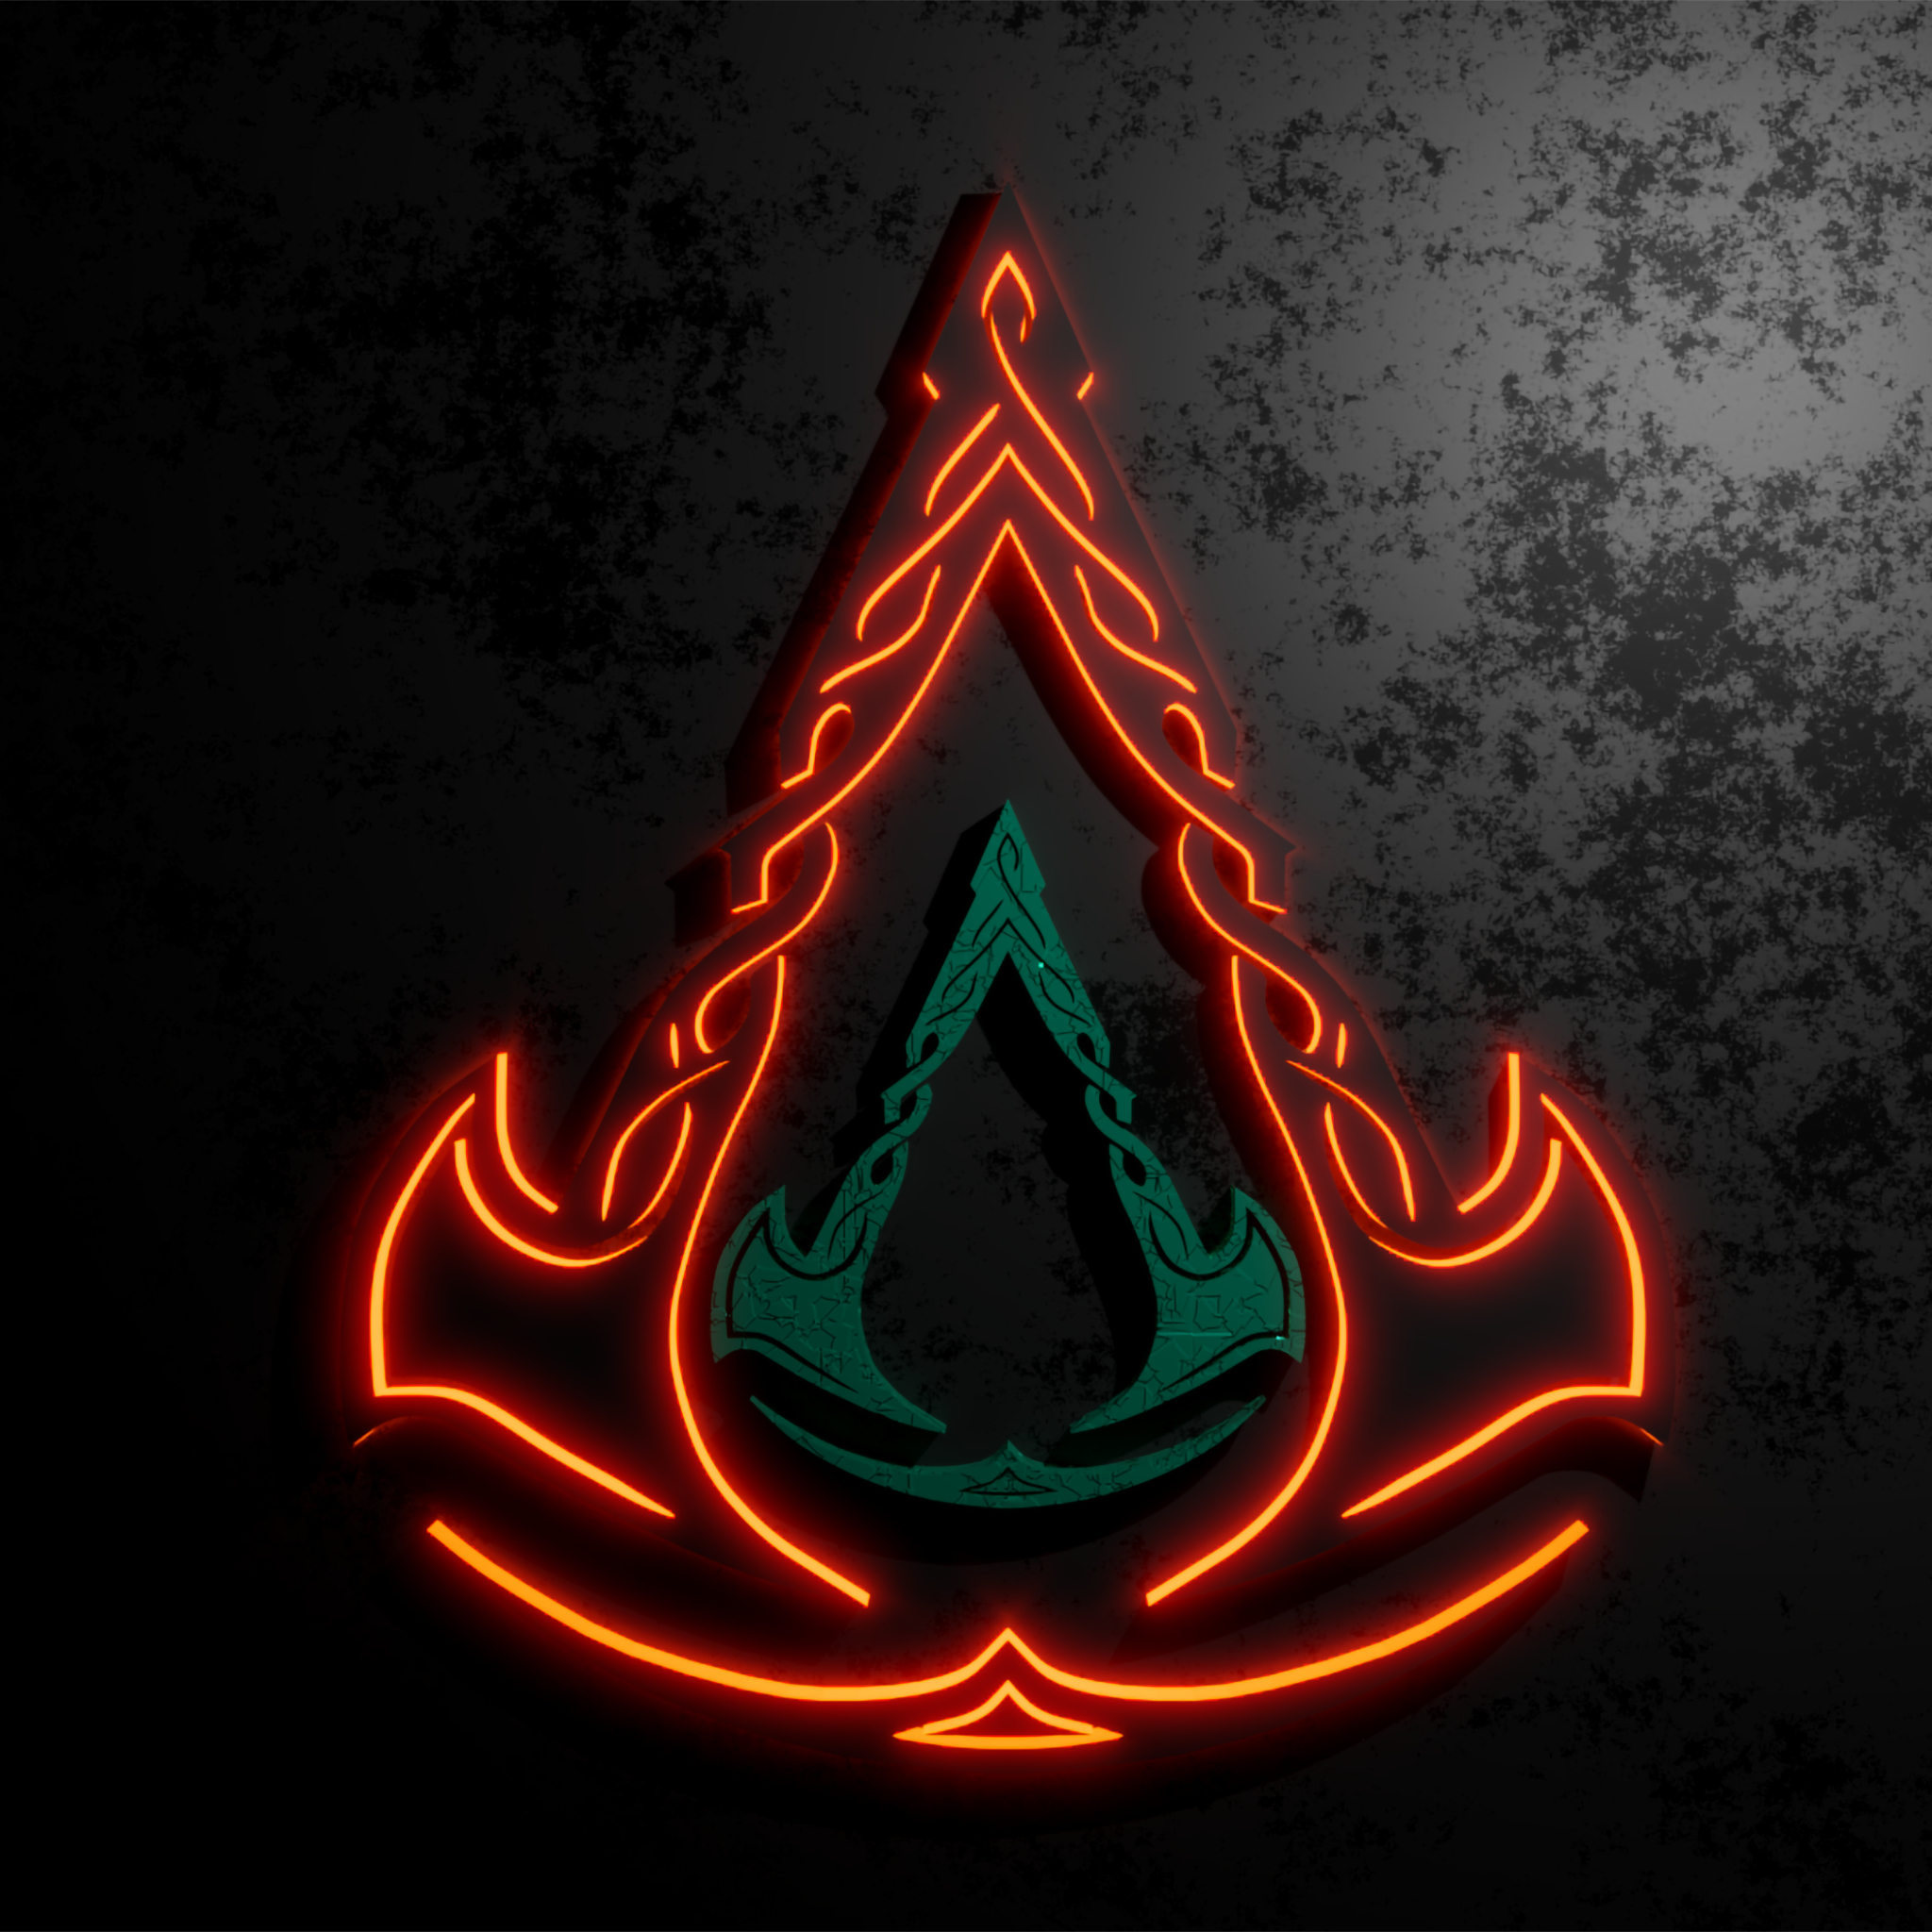 2048x2048 Assassins Creed Valhalla Cool Logo Ipad Air ...